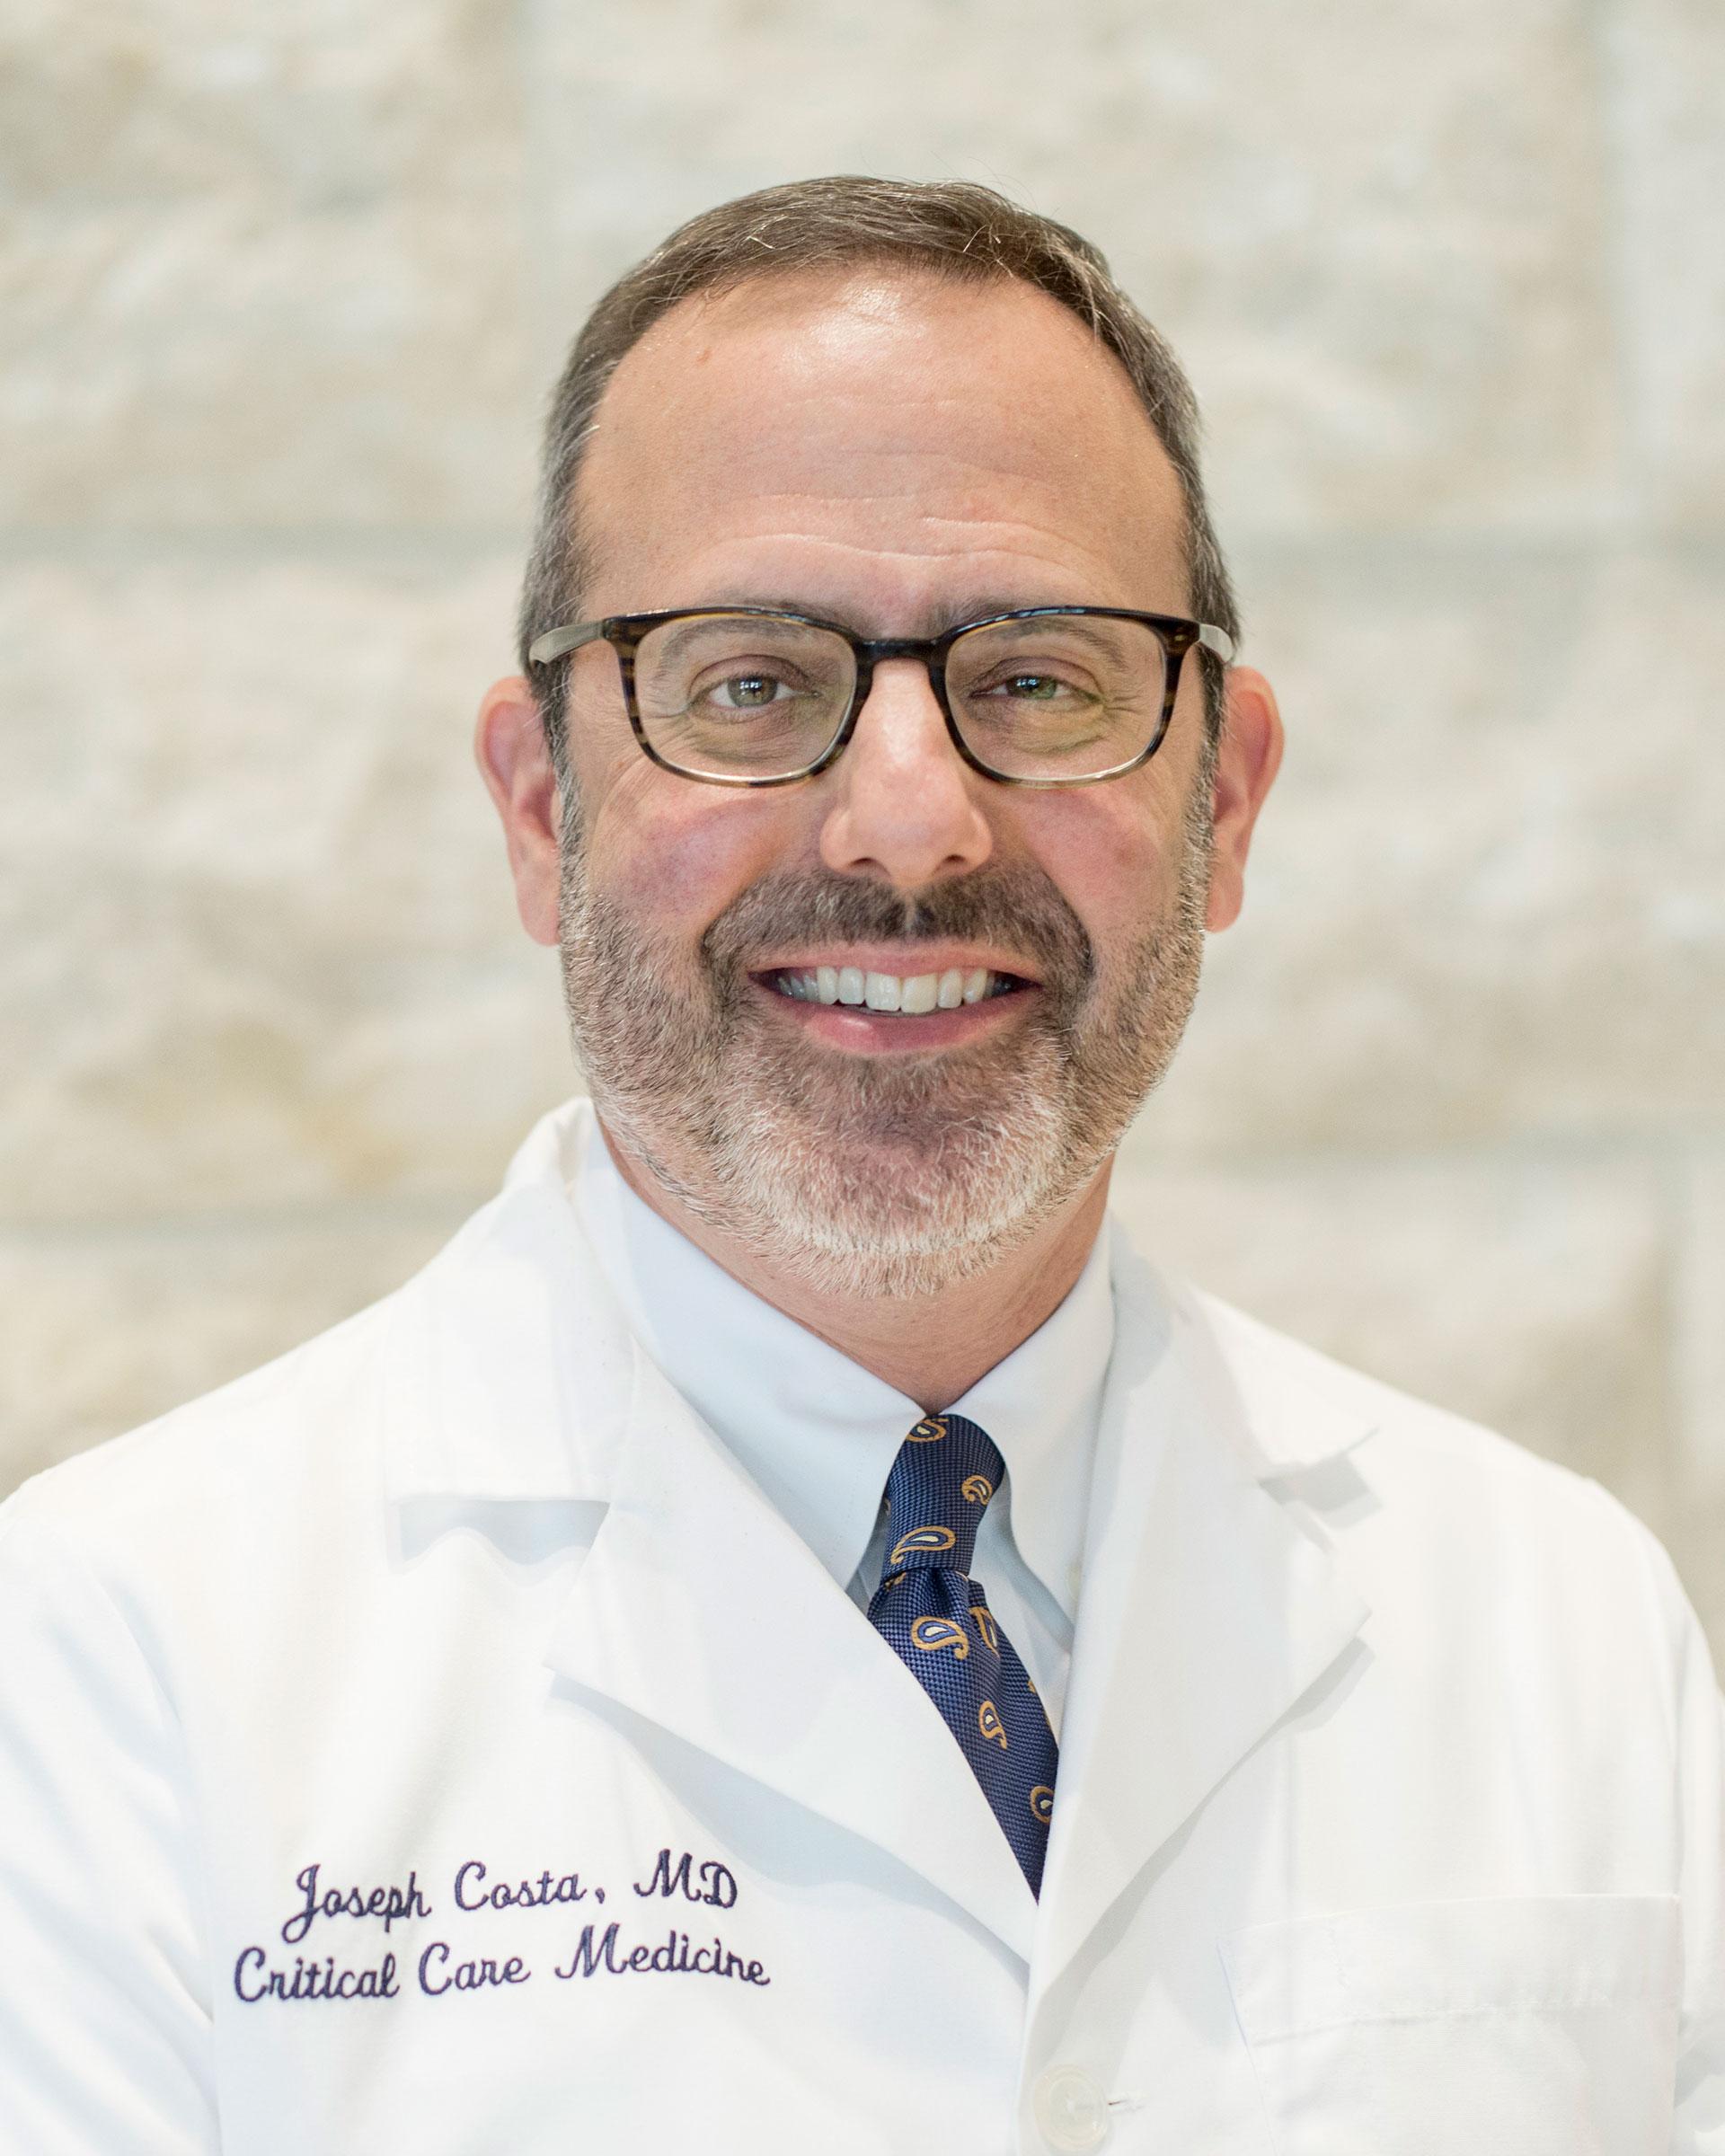 Dr. Joseph Costa